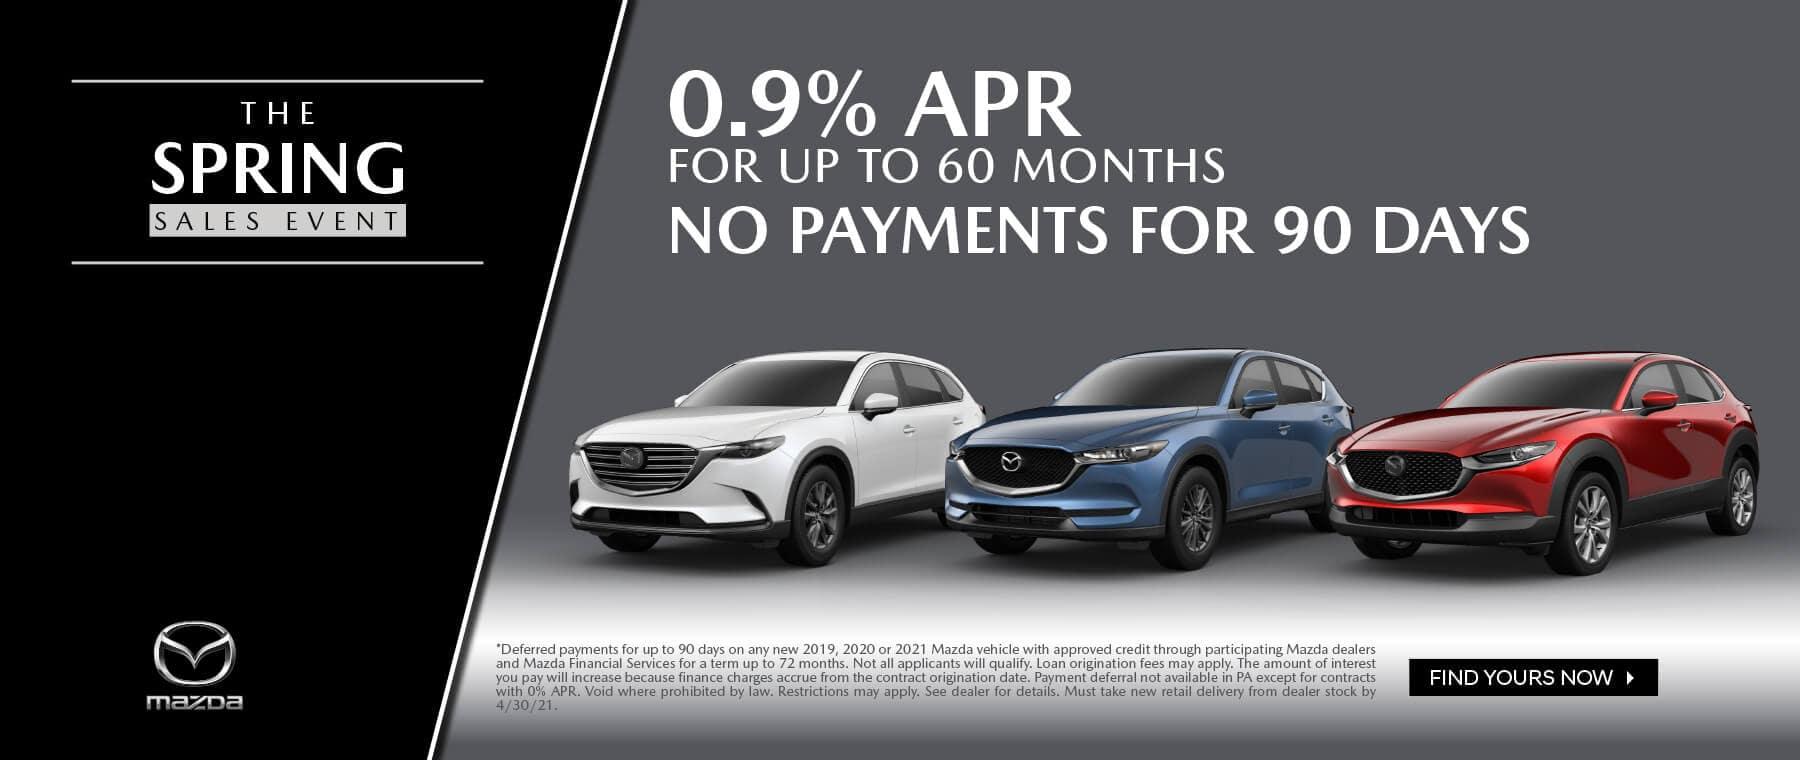 2021.03.26-Keffer-Mazda-APR-Web-Banners-S51614vw-1